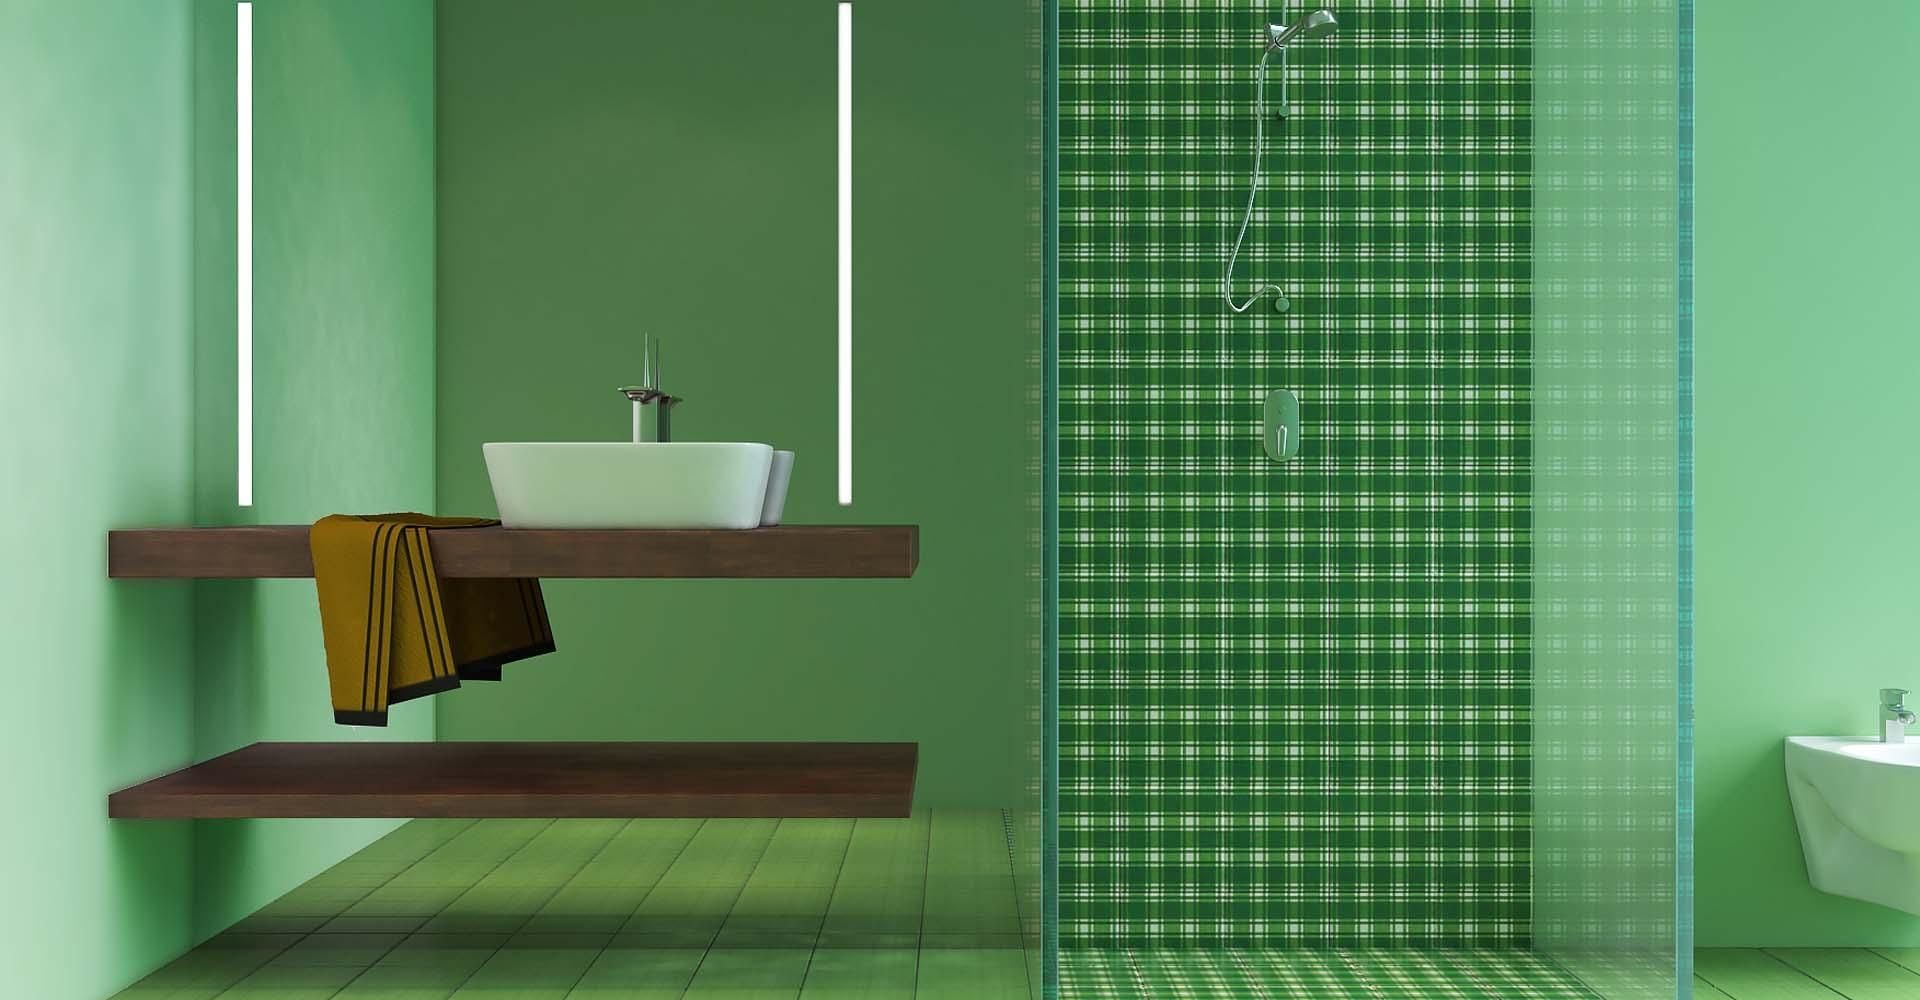 Rivestimento Bagno Mosaico Verde : Piastrelle bagno verde piastrella angolare angolari per